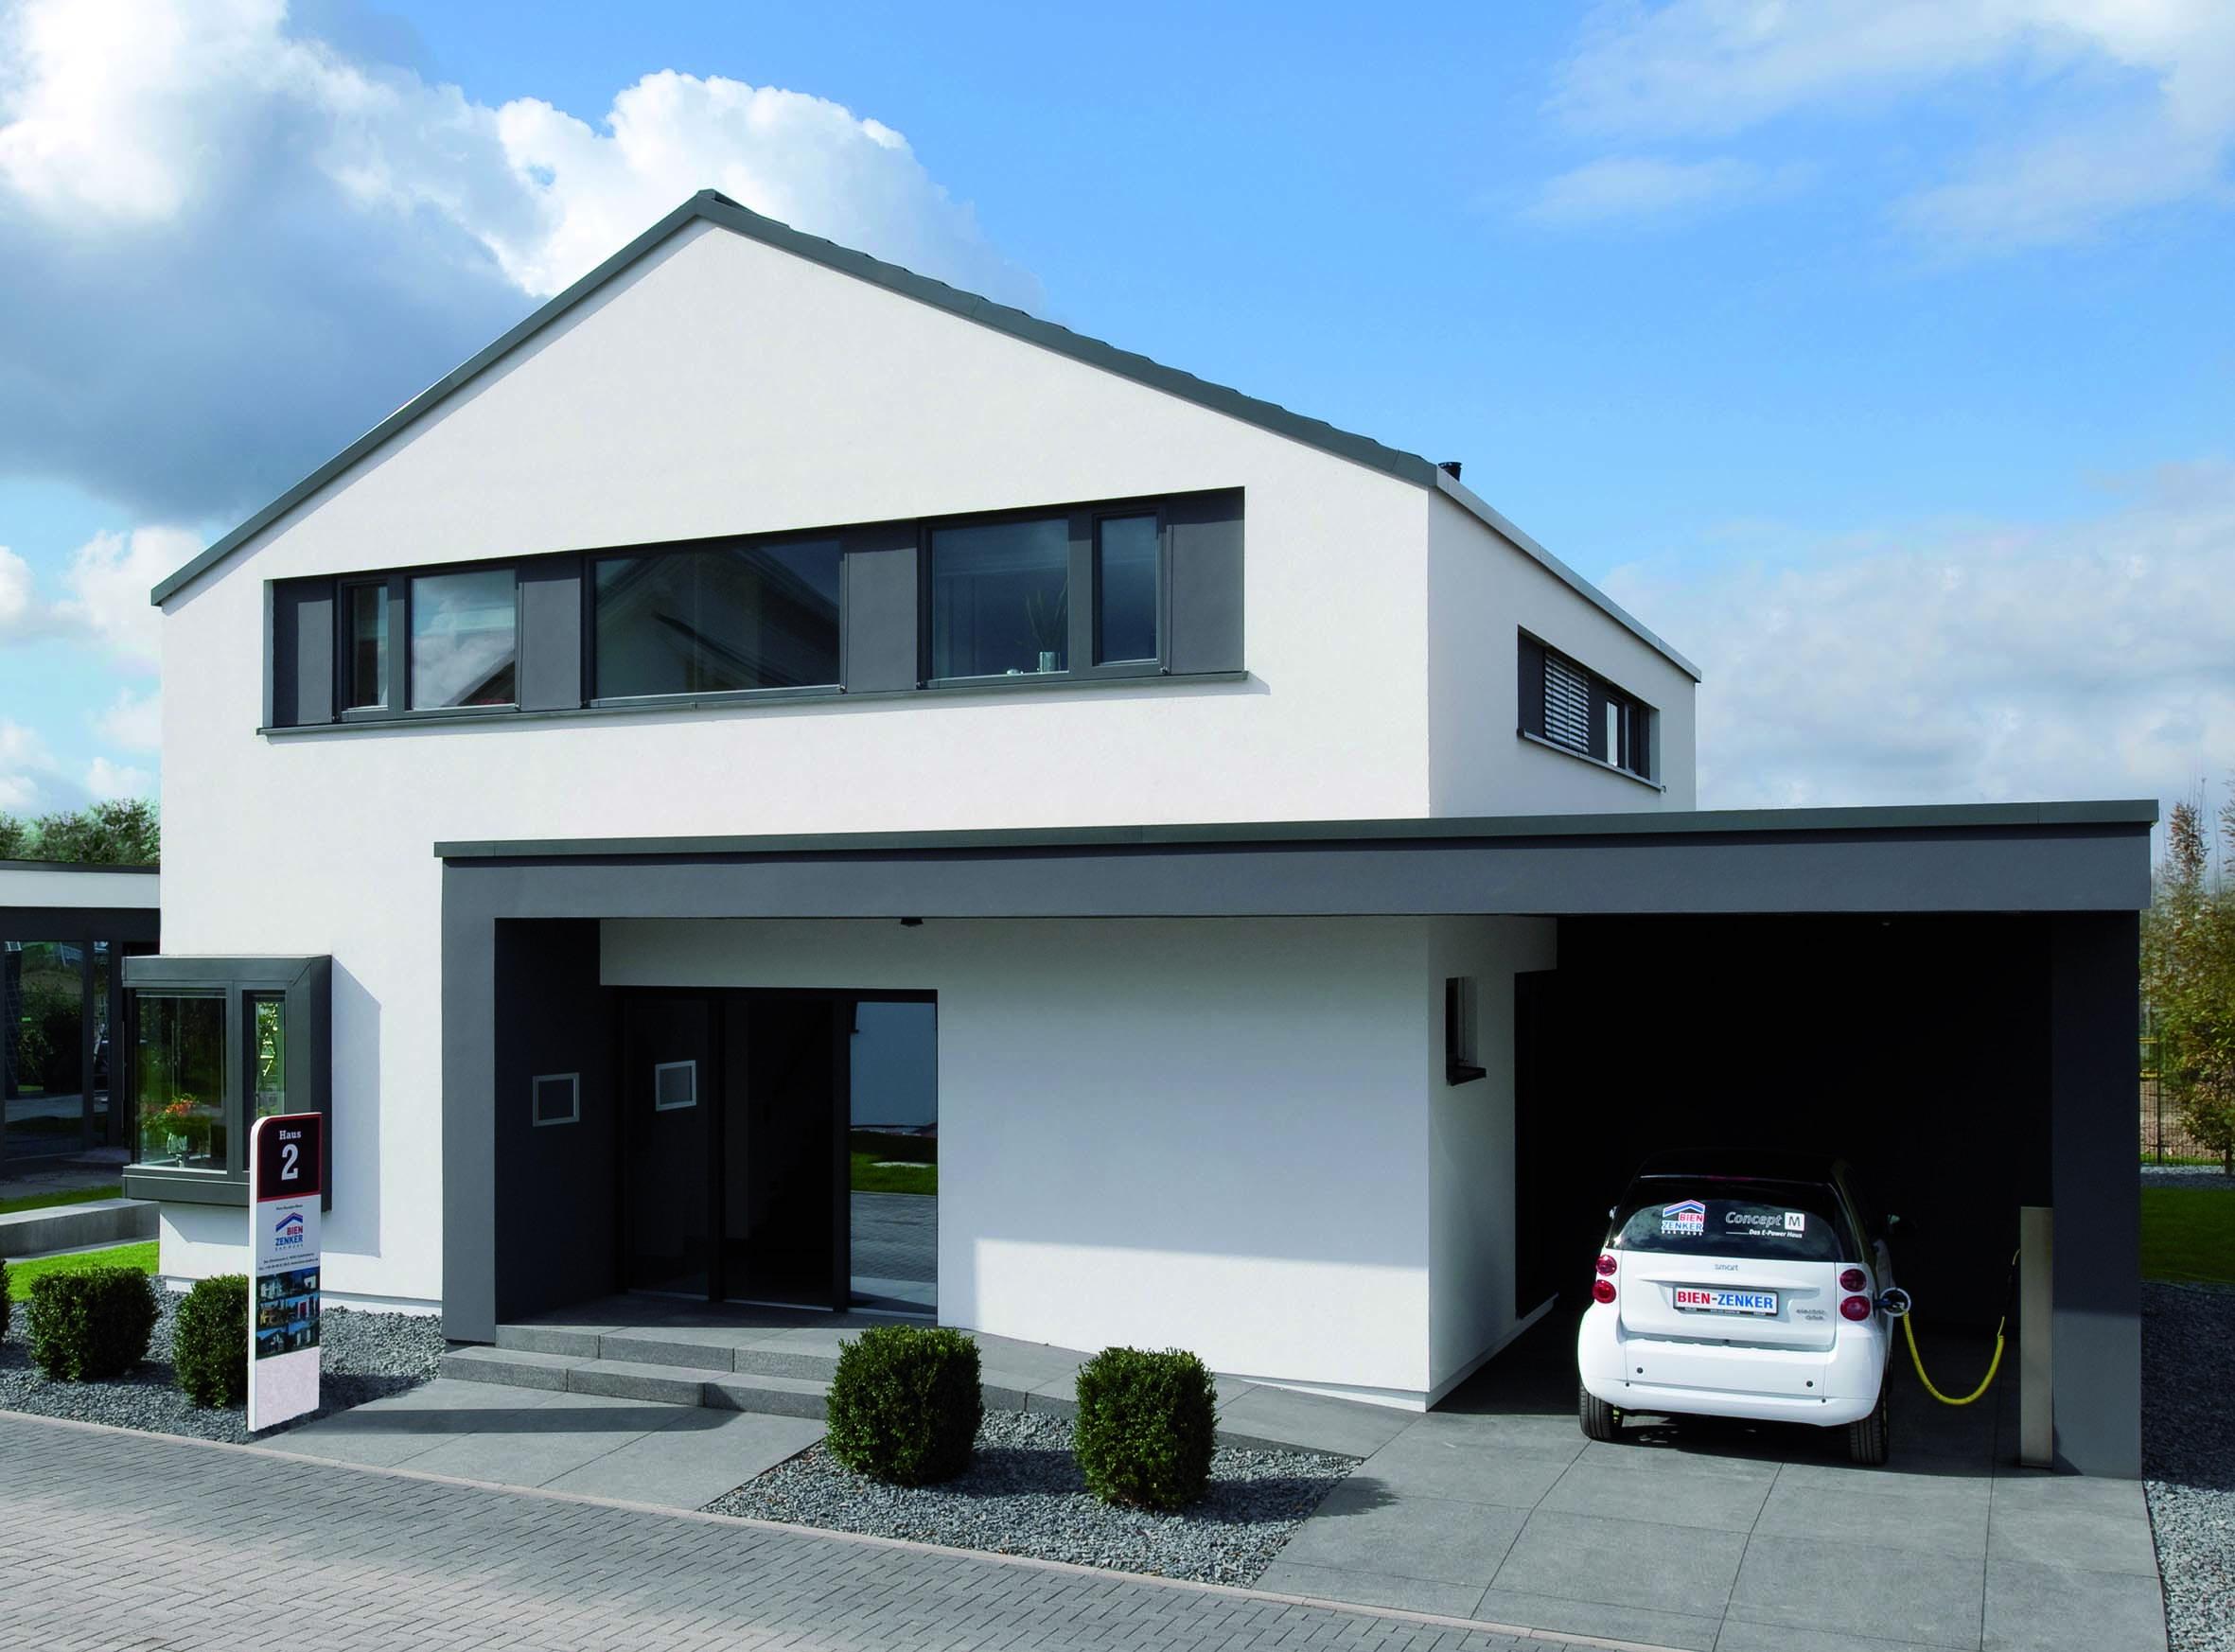 News bdf e v for Stadtvilla zweifamilienhaus